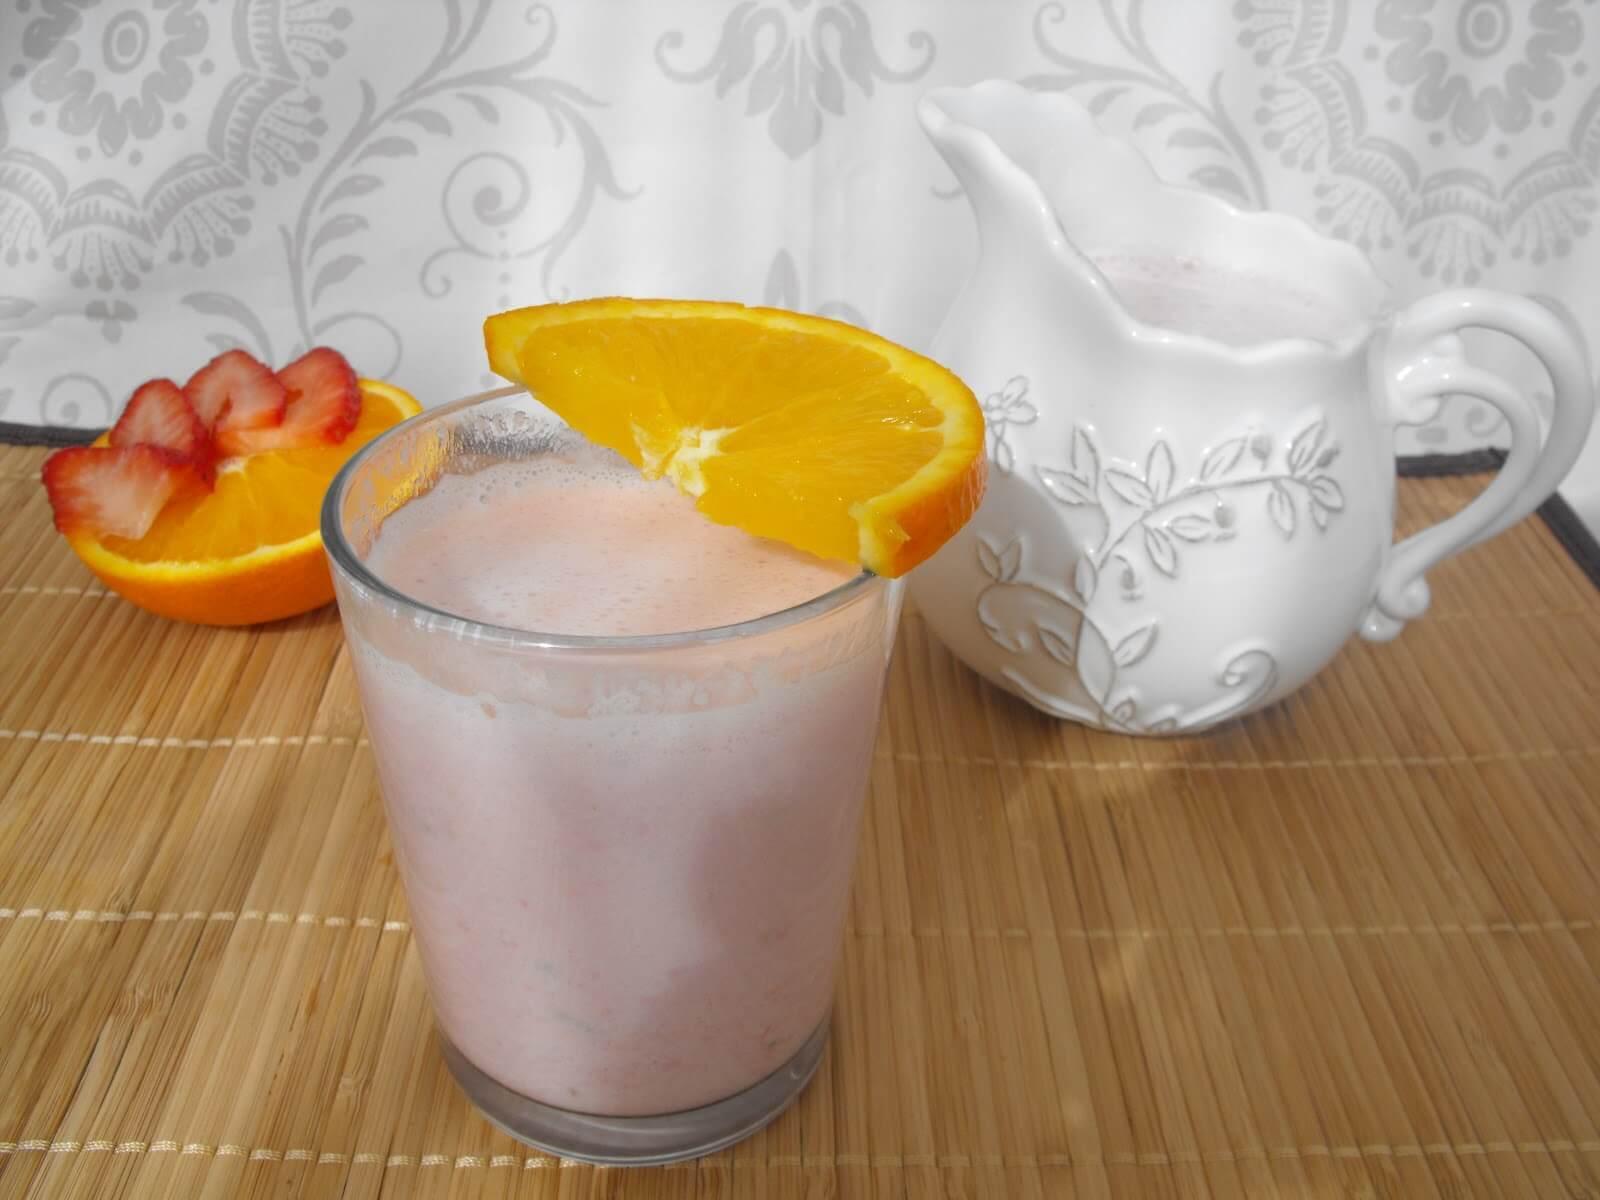 jordgubb smoothie